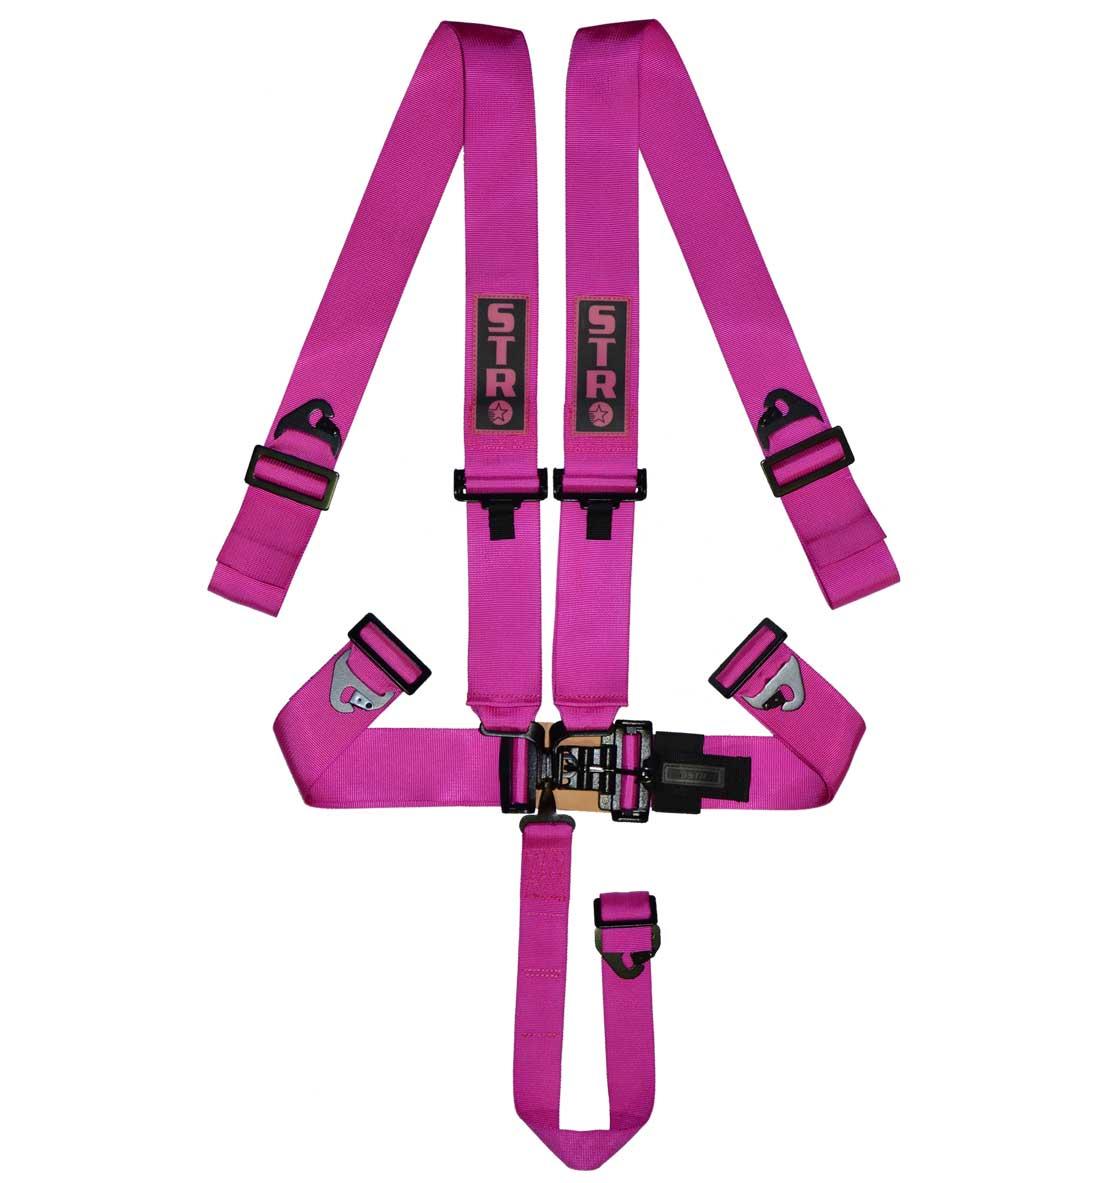 STR 5-Point NASCAR Latch Harness - Pink